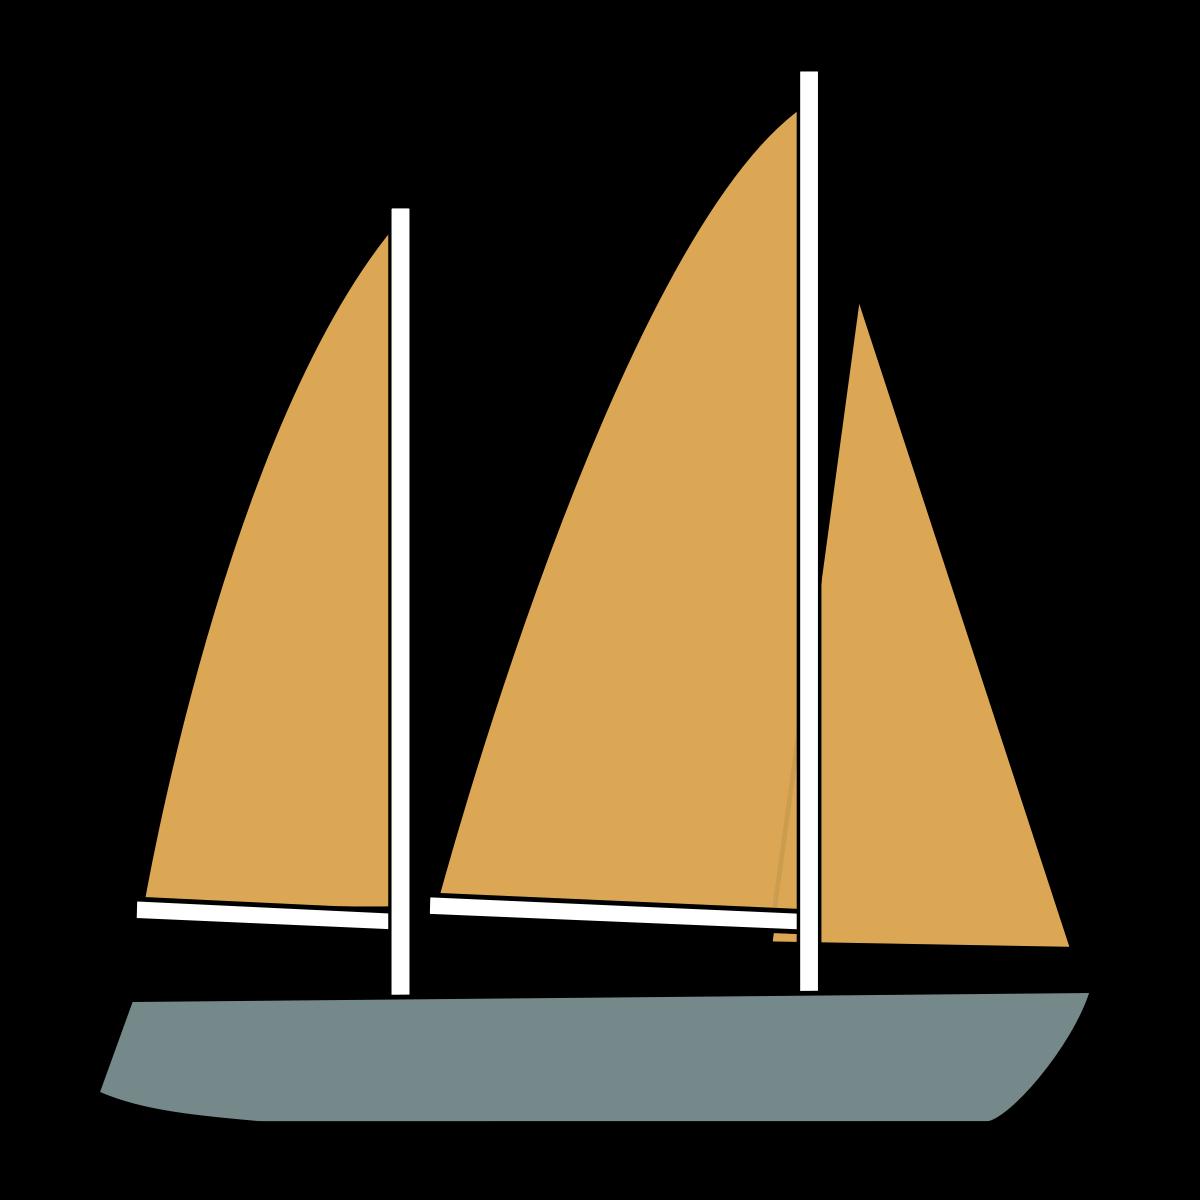 Ketch wikipedia . Orange clipart sailboat